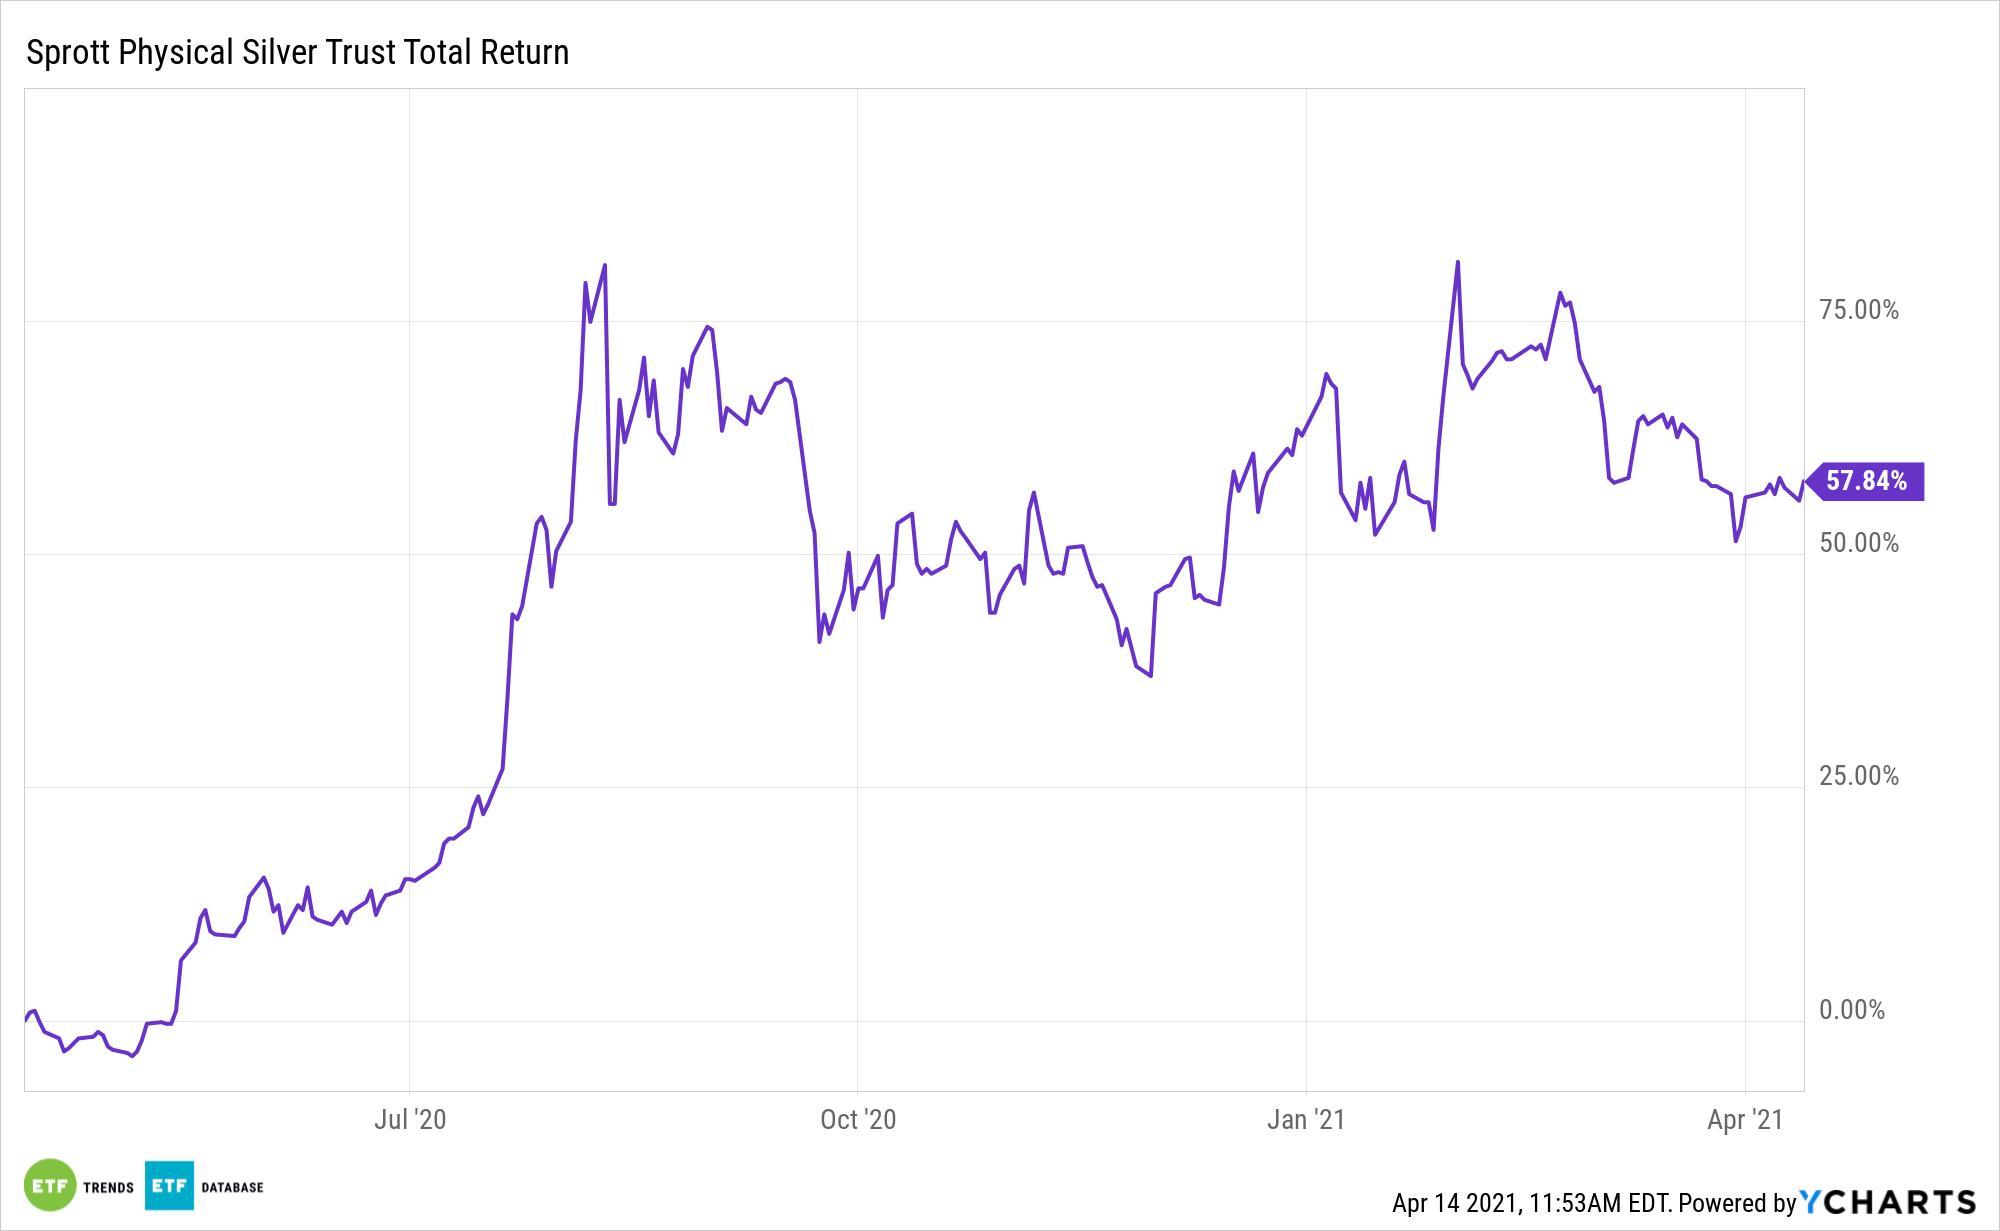 PSLV 1 Year Total Return